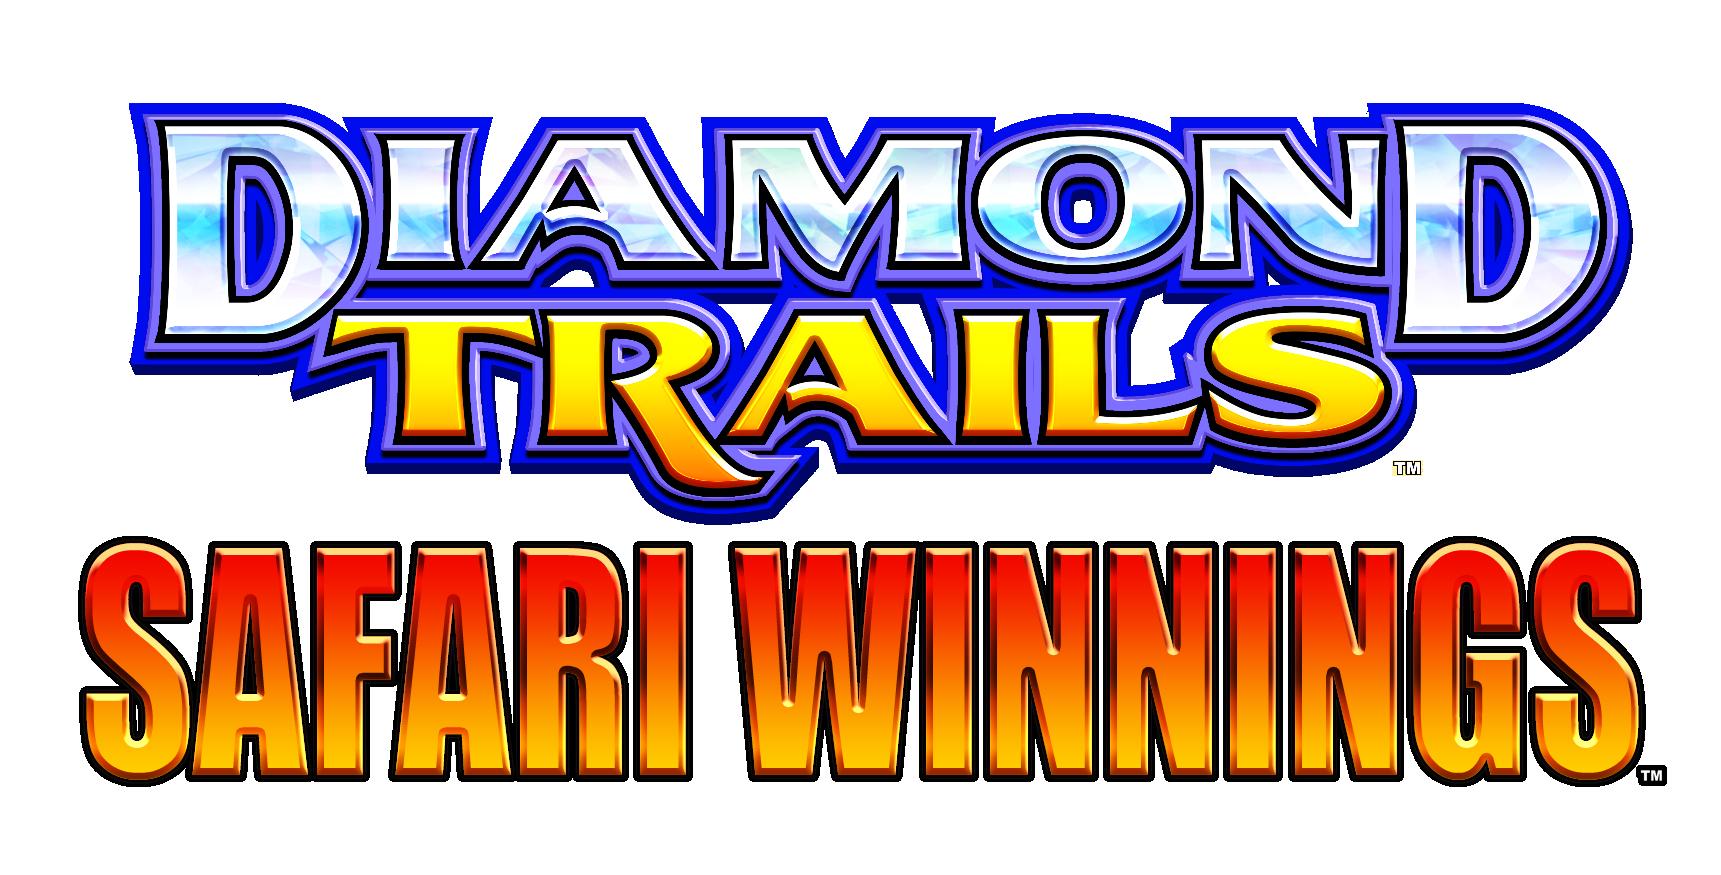 Diamond Trails Safari Winnings Logo